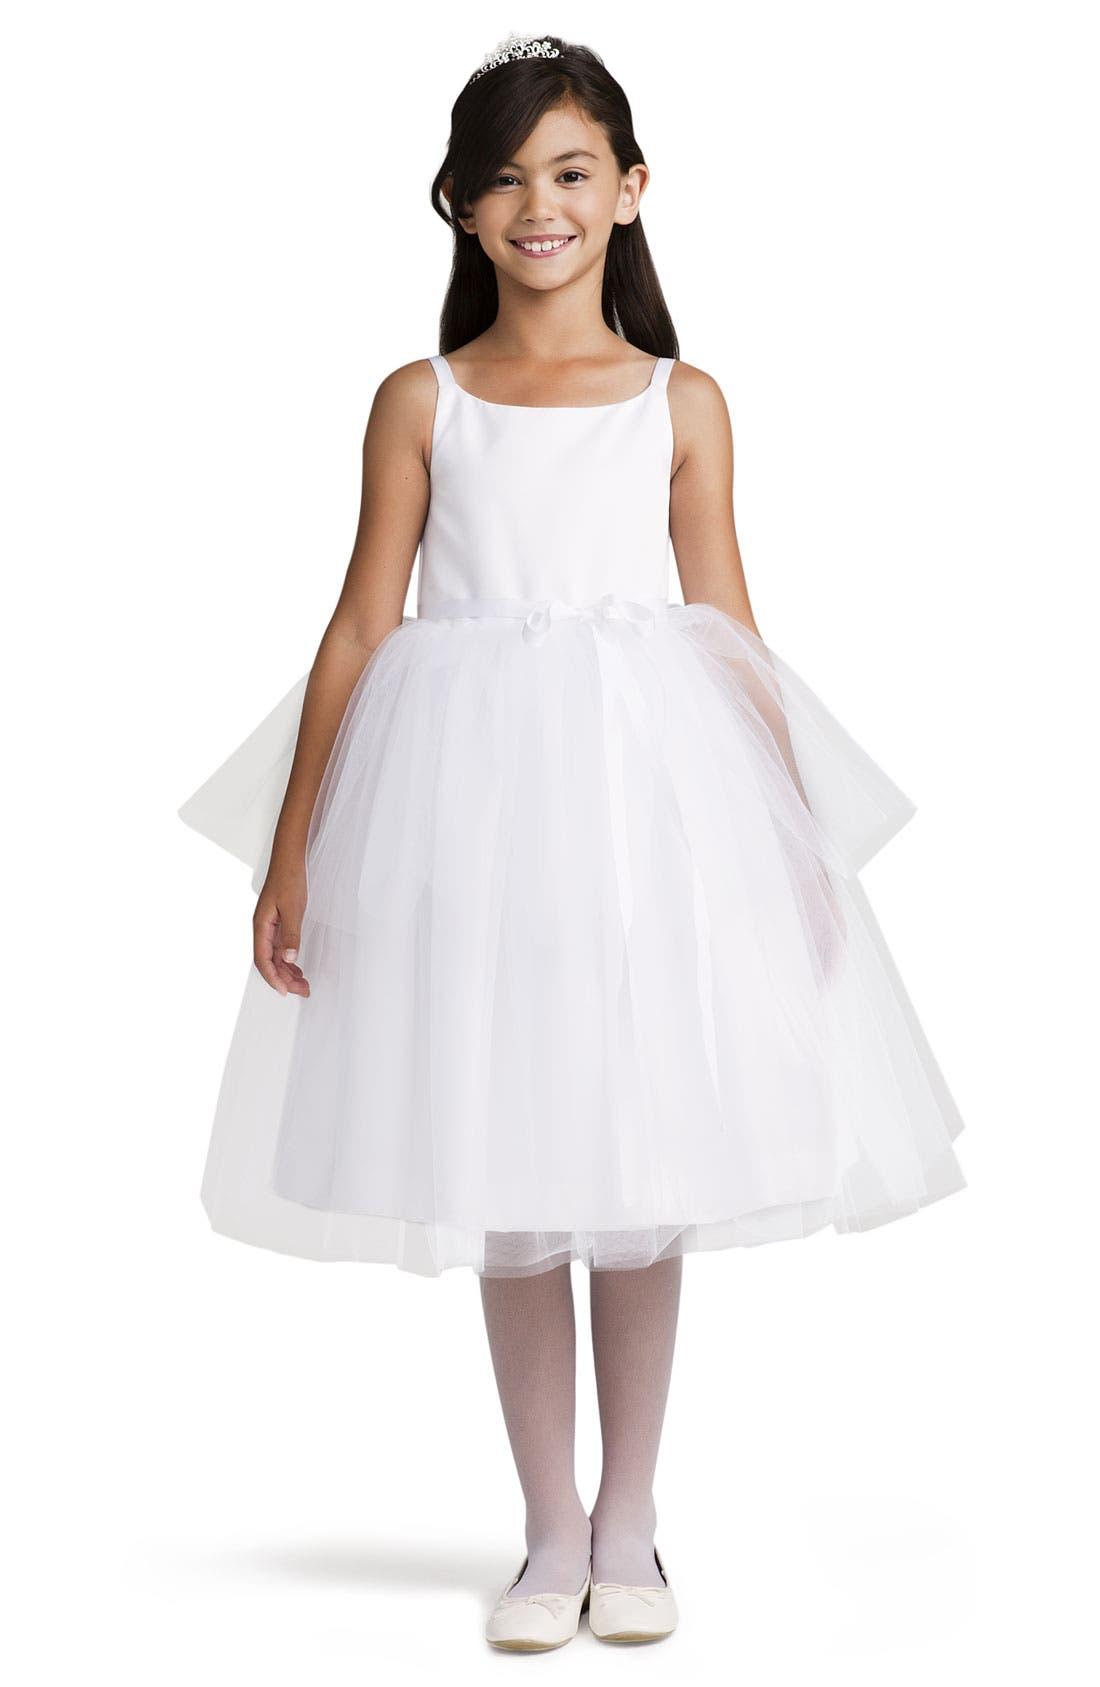 Alternate Image 1 Selected - Us Angels Tulle Ballerina Dress (Big Girls)